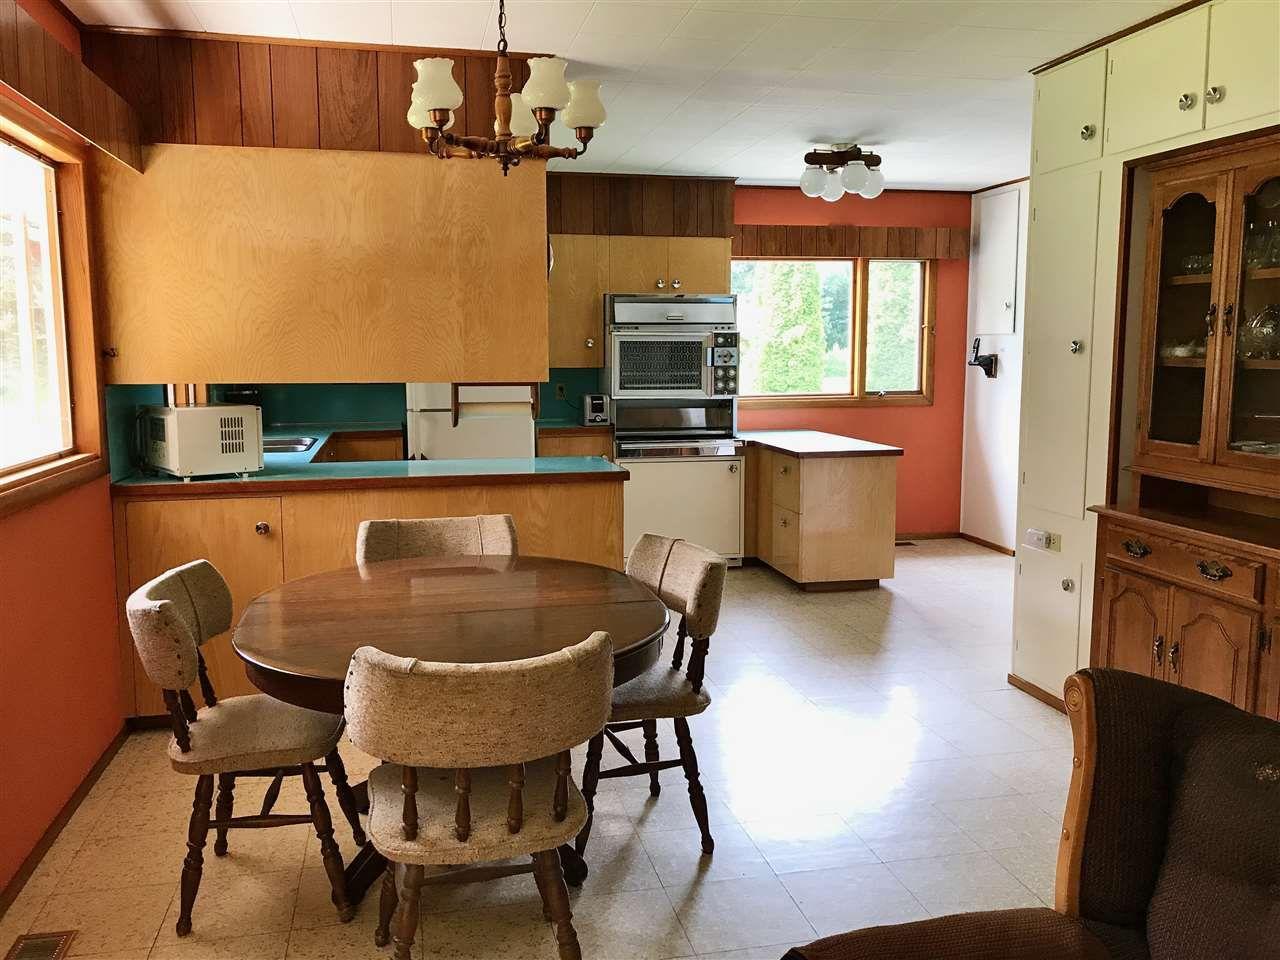 Photo 11: Photos: 944 MACKENZIE Highway in Bella Coola: Bella Coola/Hagensborg House for sale (Williams Lake (Zone 27))  : MLS®# R2482254